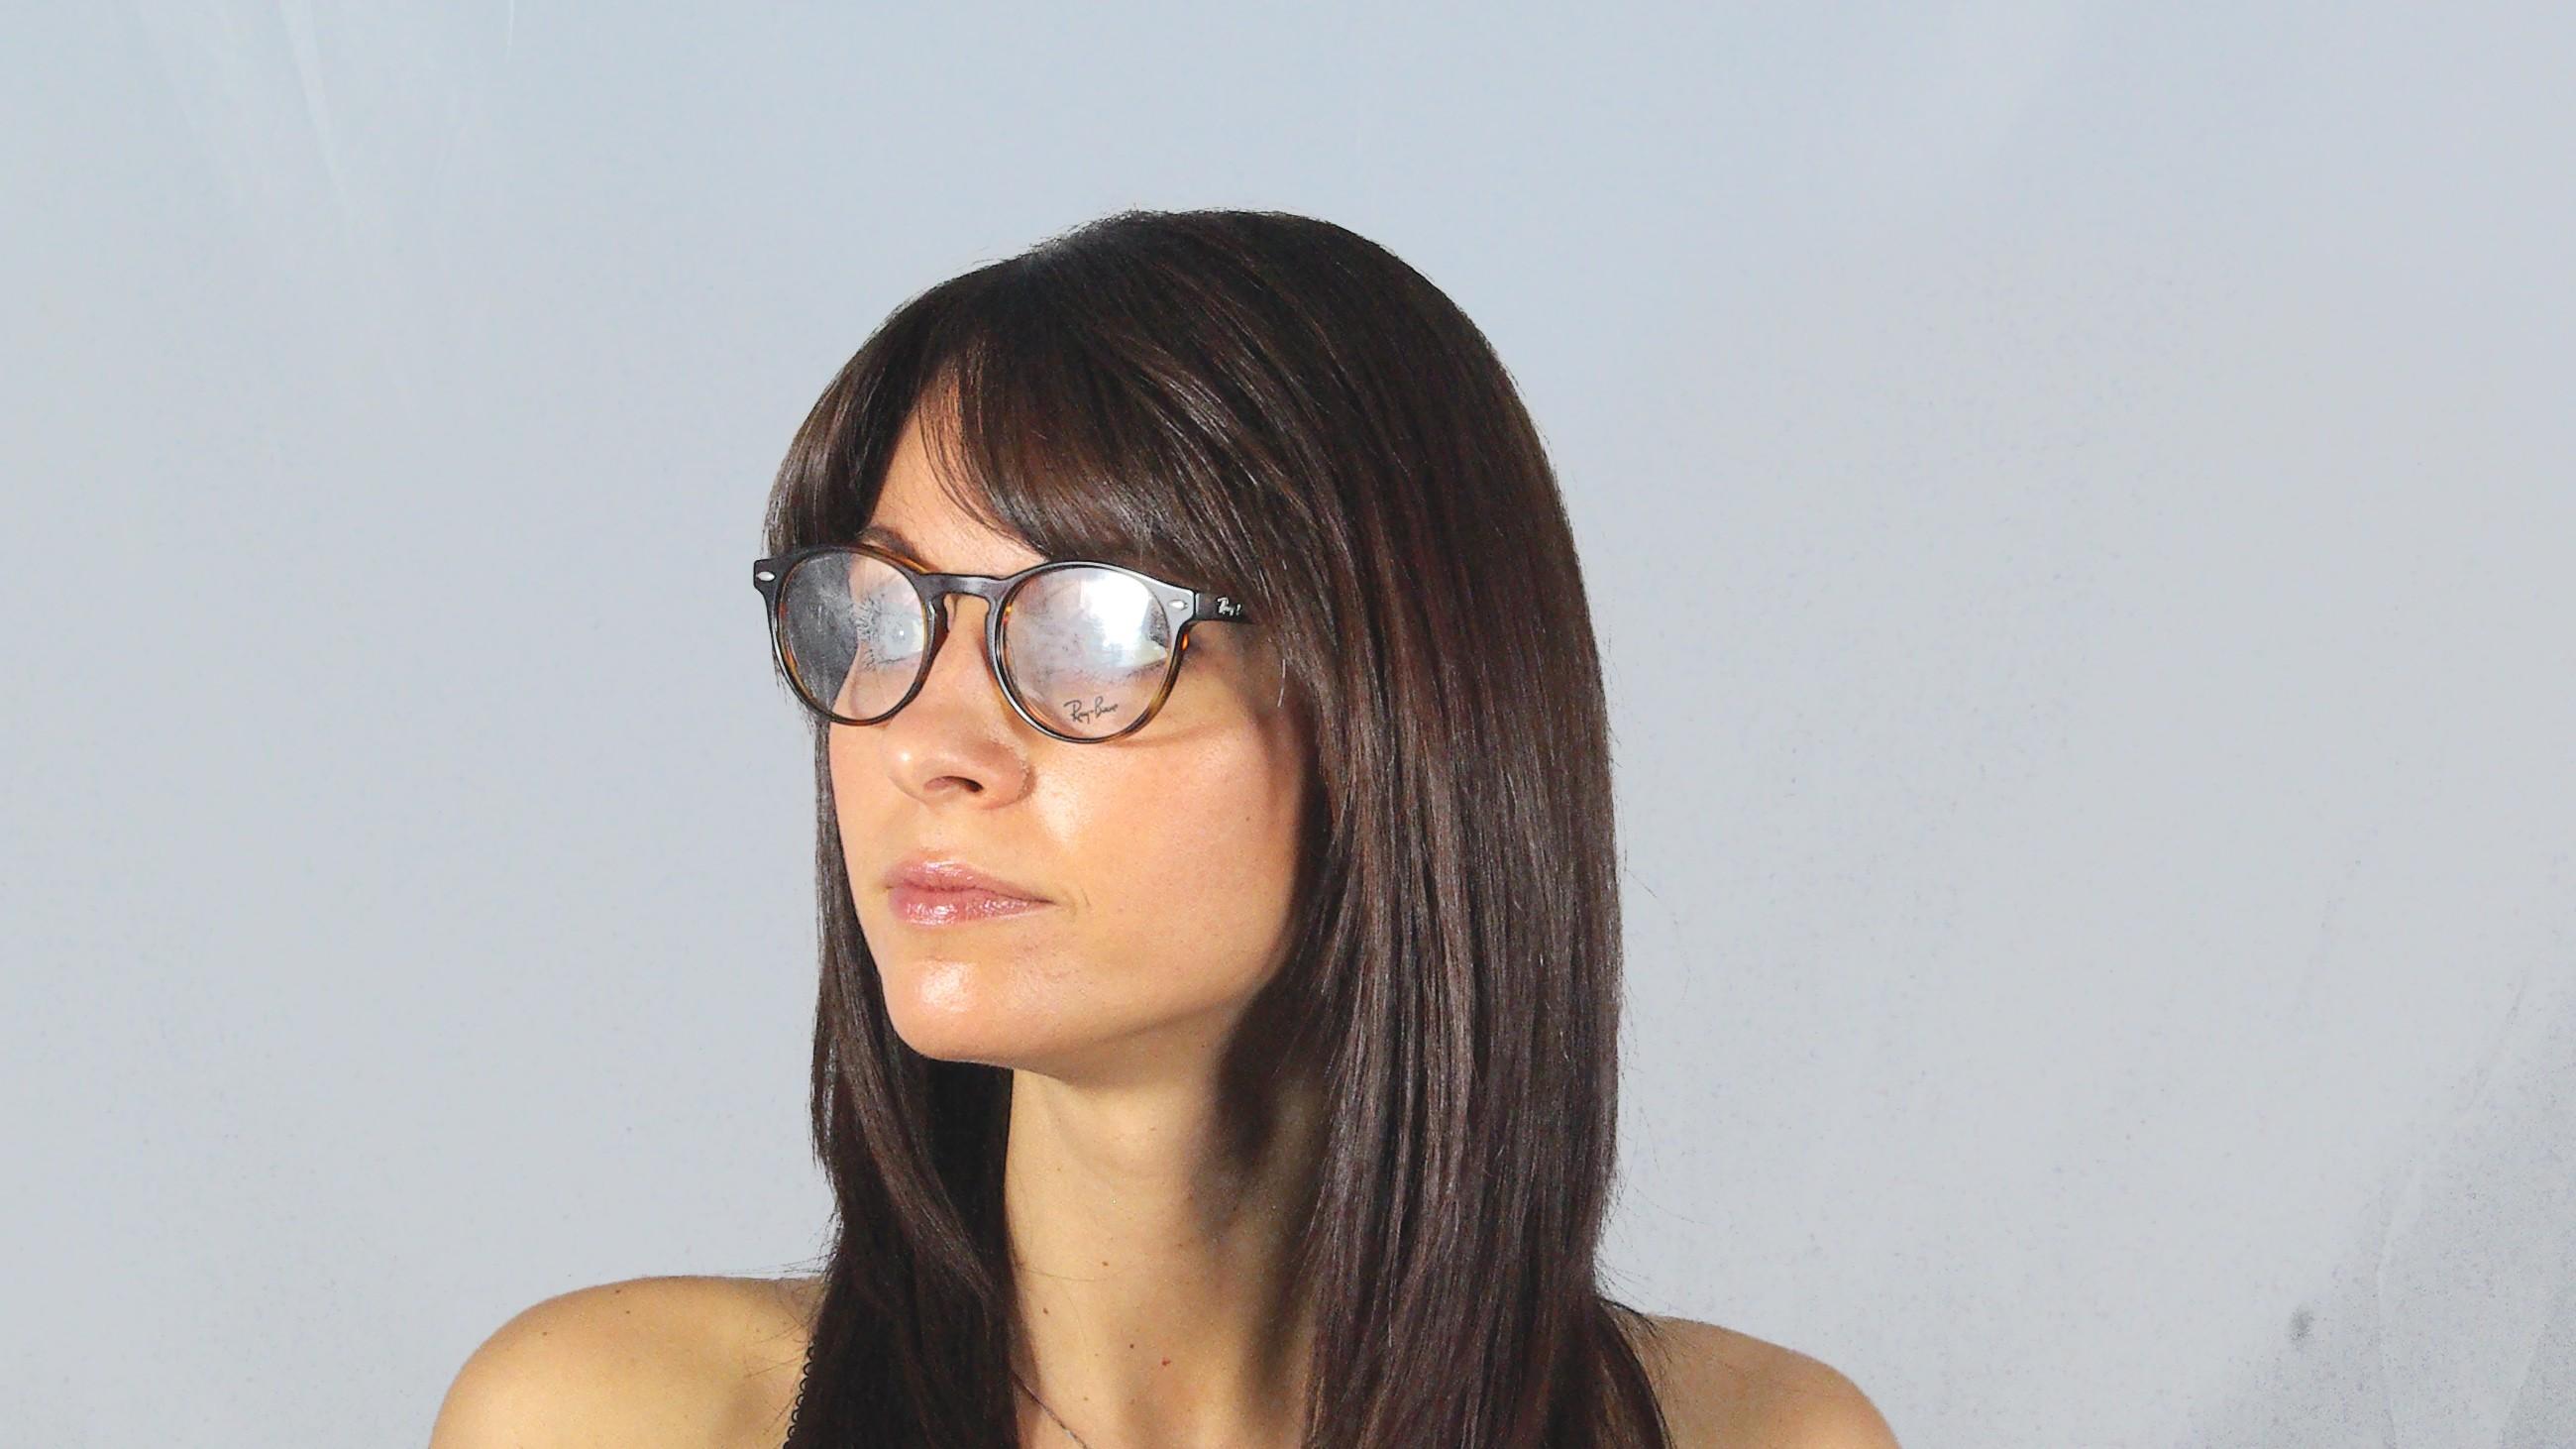 Eye Glasses Ray Ban Rx Rb 5283 2144 Tortoise Visiofactory